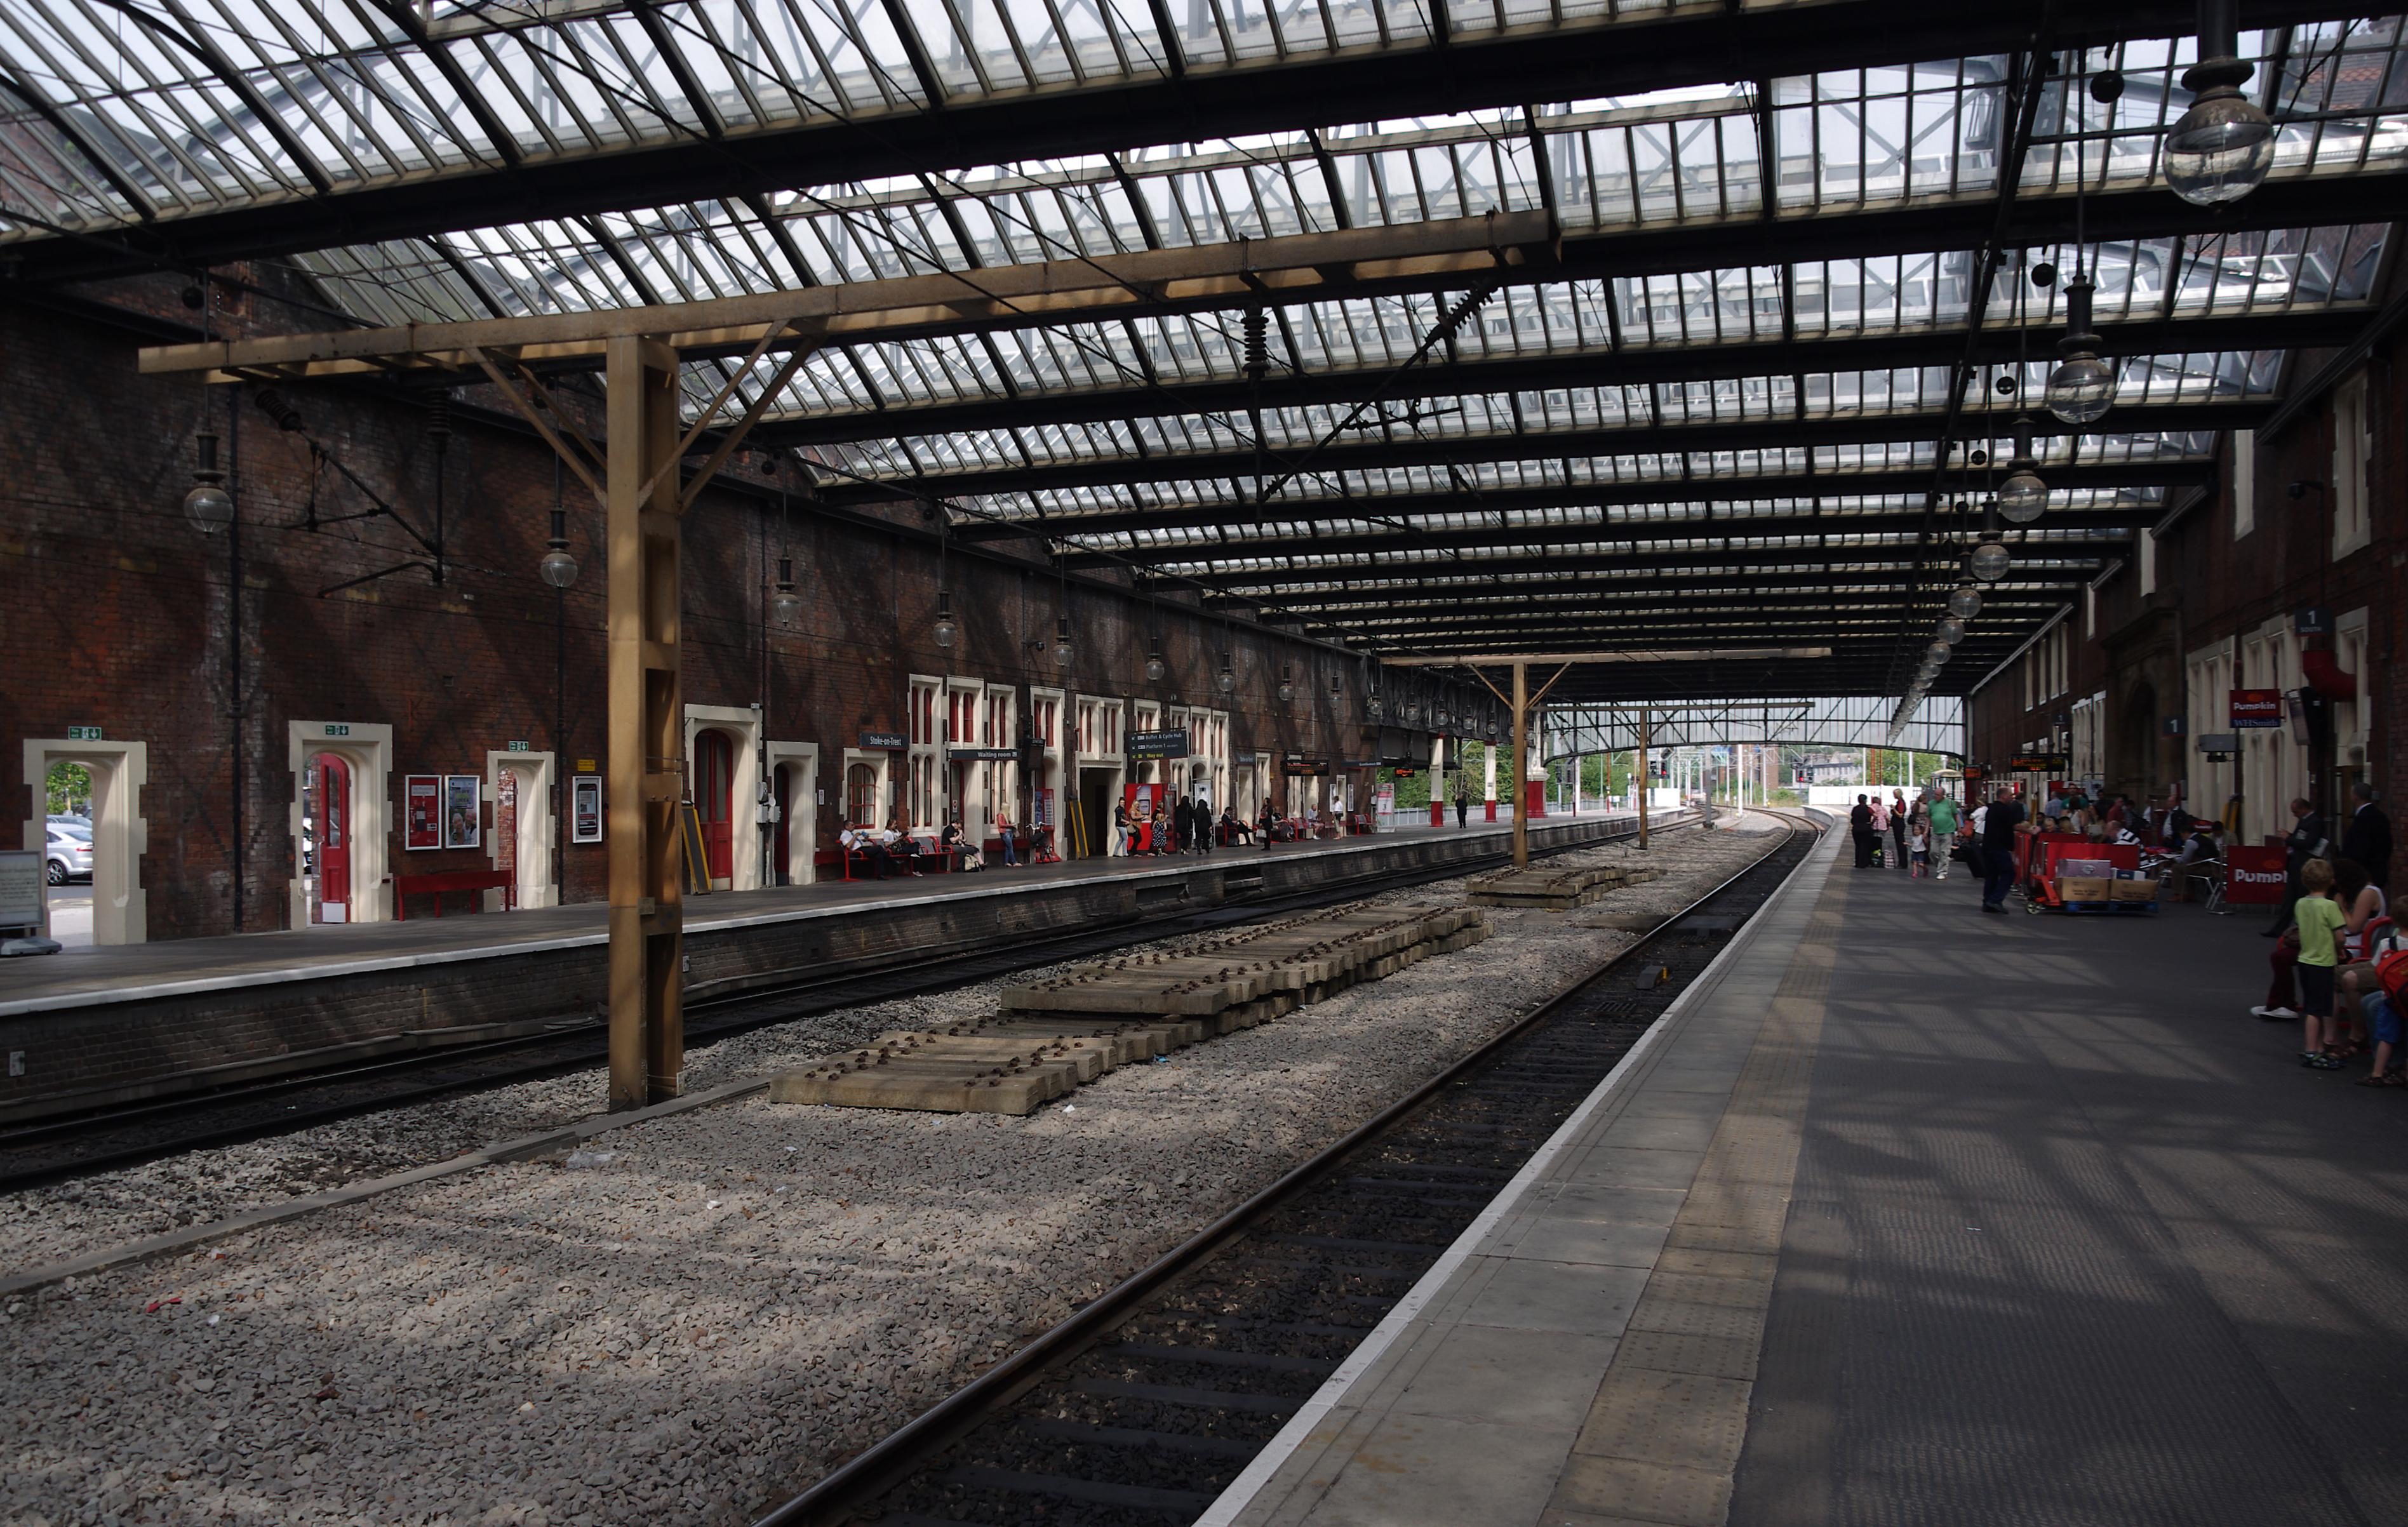 Craigslist Personals St Cloud Stoke On Trent